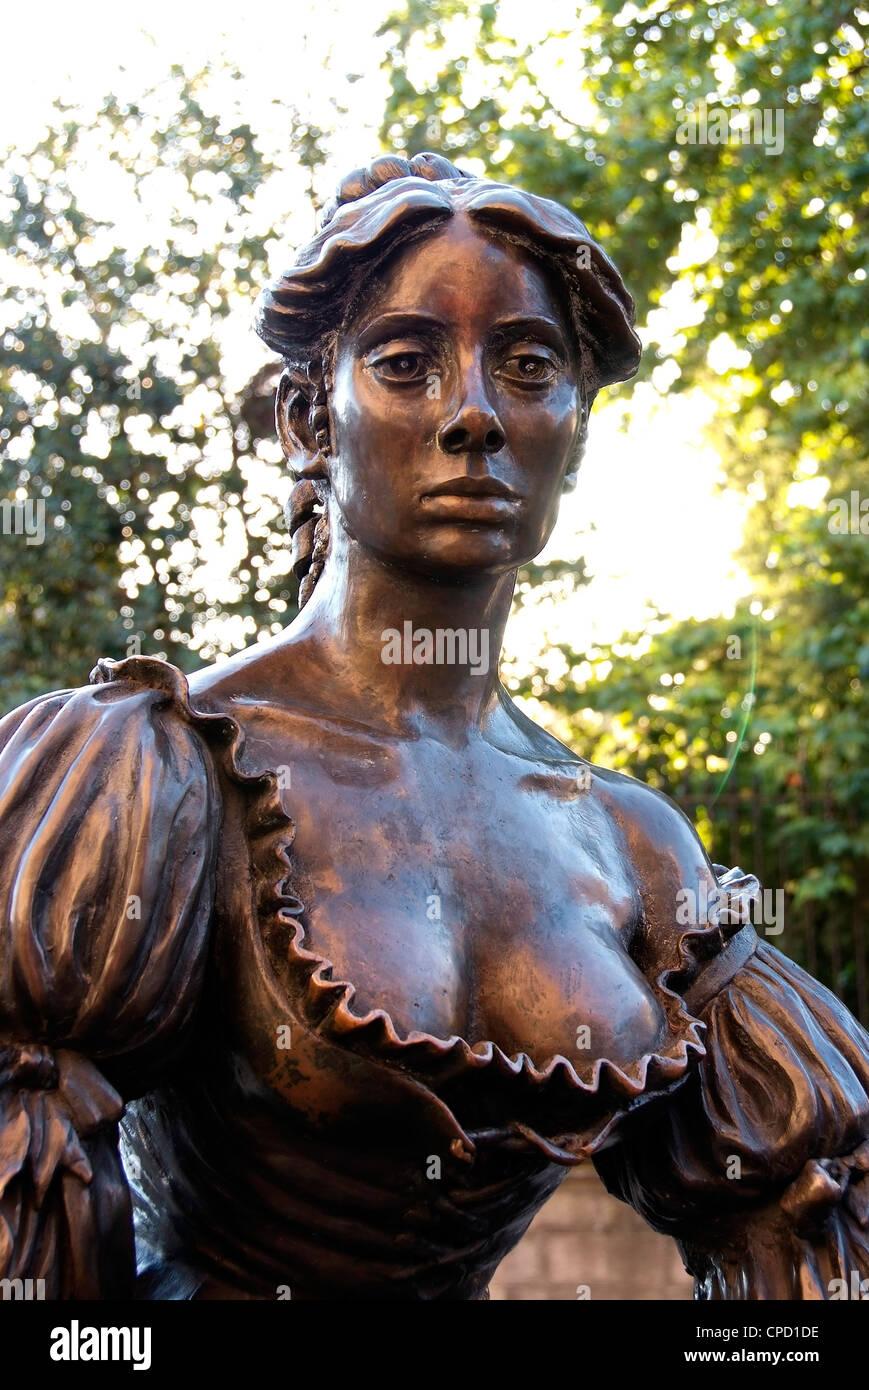 Molly Malone statue, Grafton Street, Dublin, Republic of Ireland, Europe Stock Photo